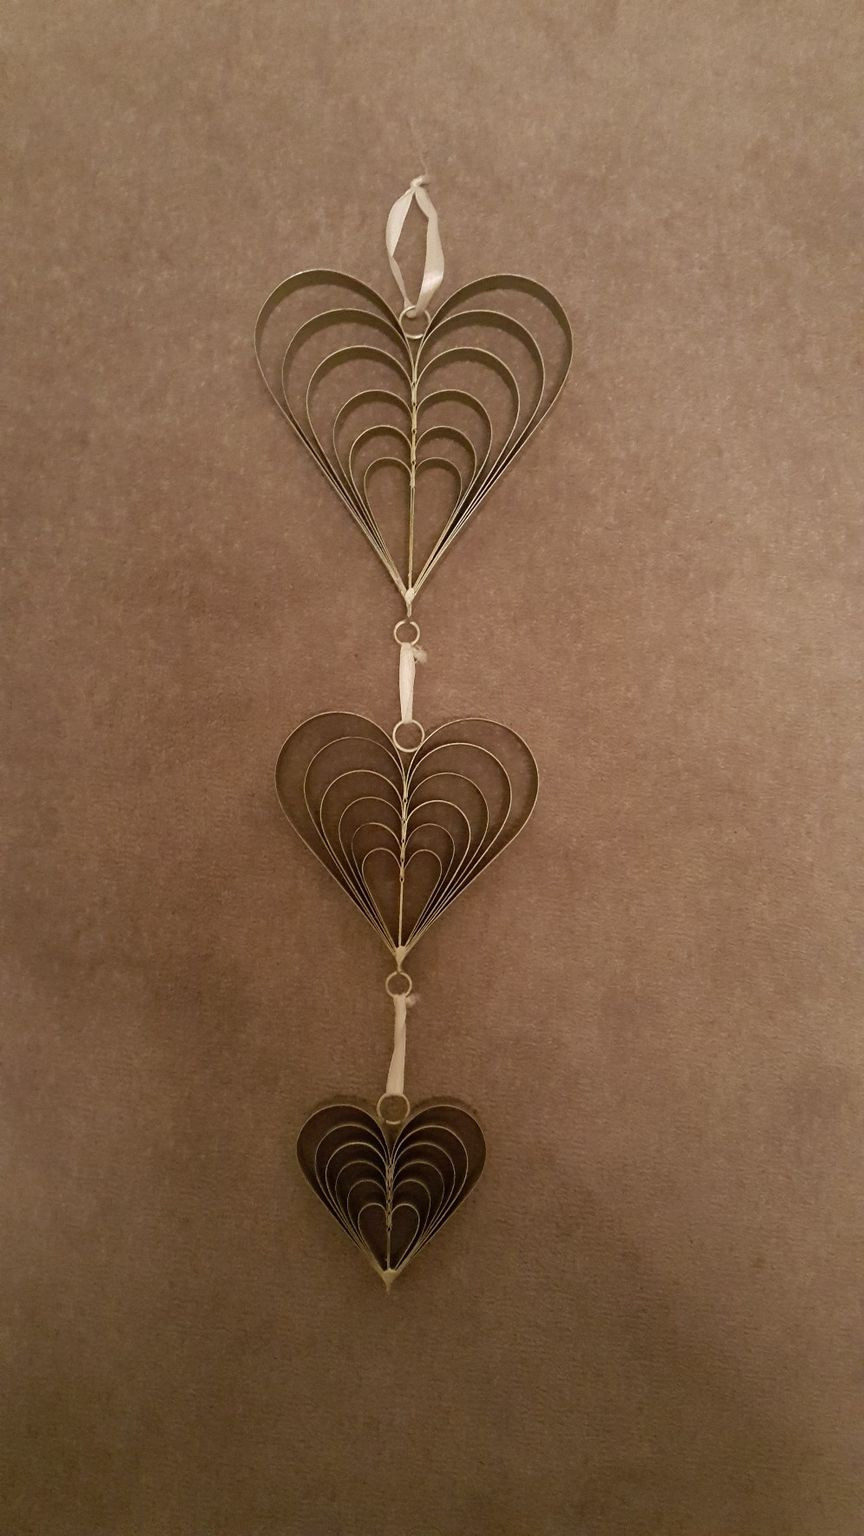 anatomic heart vase of https en shpock com i whca4 hi 1tjb1ue 2018 03 13t165716 pertaining to silver metal hanging hearts from next